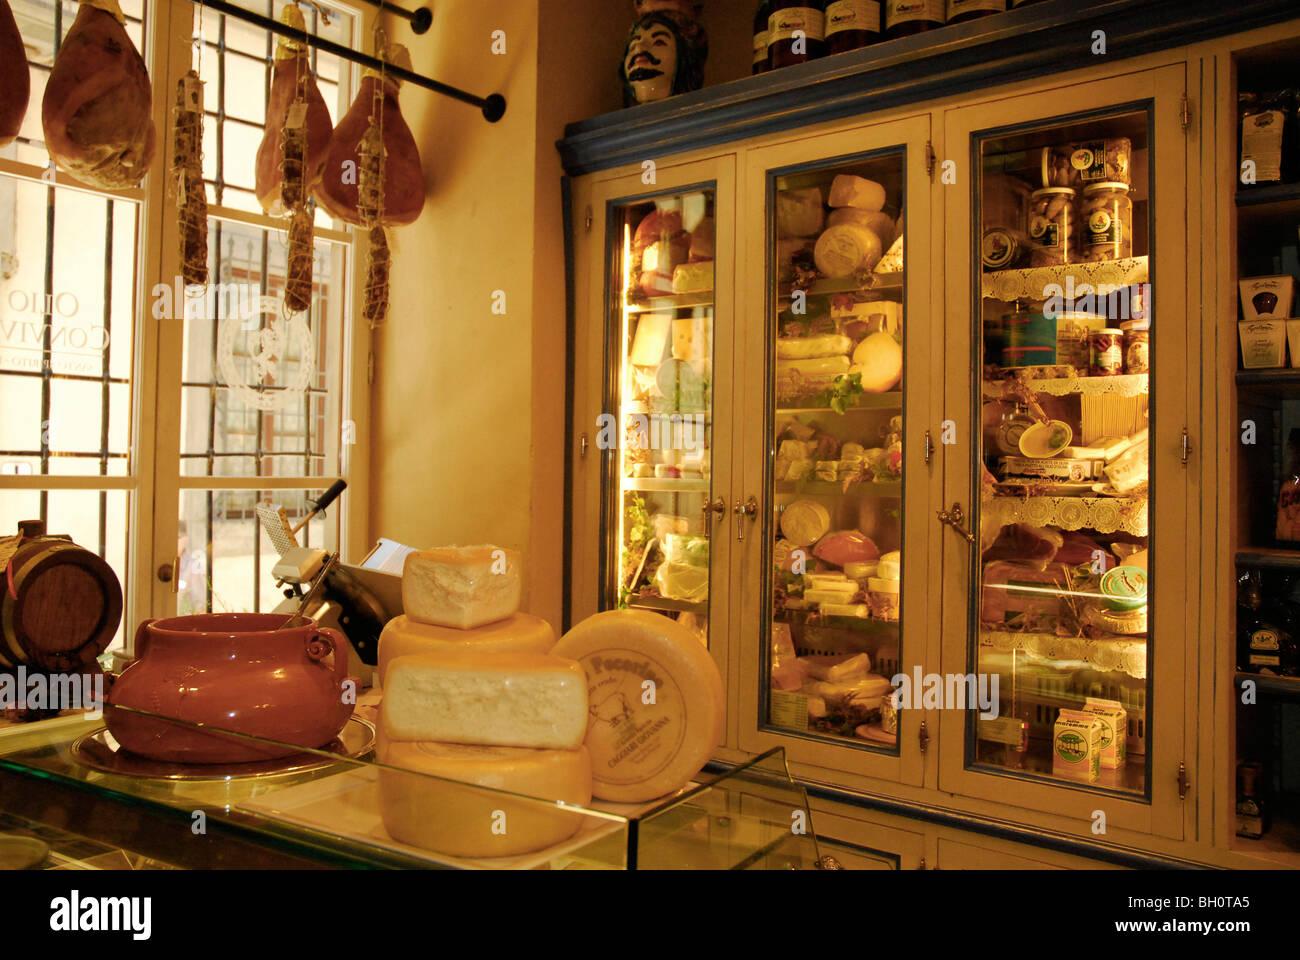 Interior view of the delikatessen Olio & Convivum, Via S. Spirito, Florence, Tuscany, Italy, Europe - Stock Image